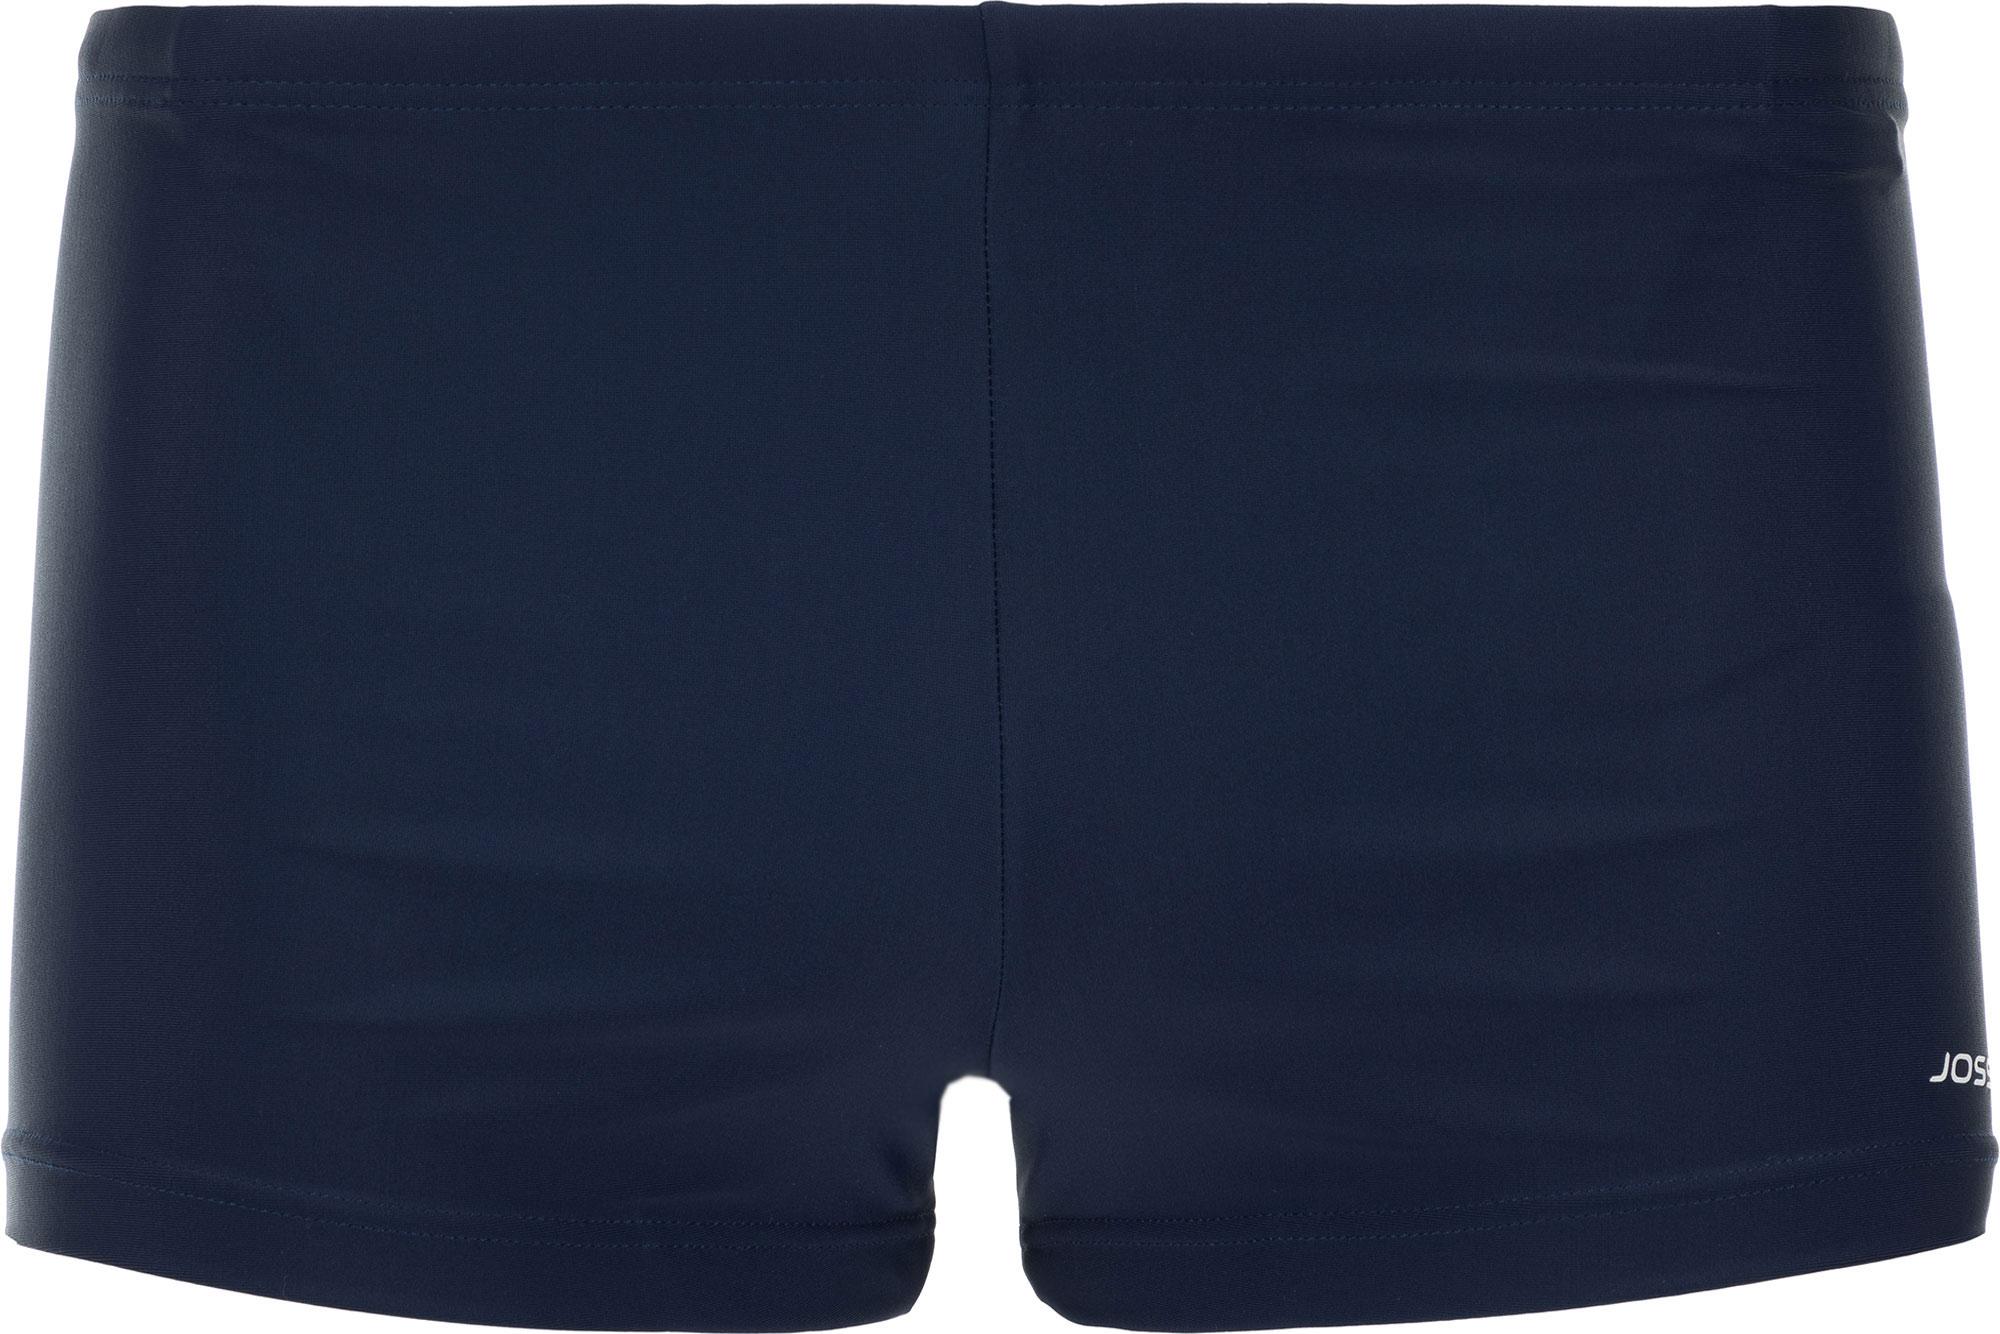 лучшая цена Joss Плавки-шорты мужские Joss, размер 56